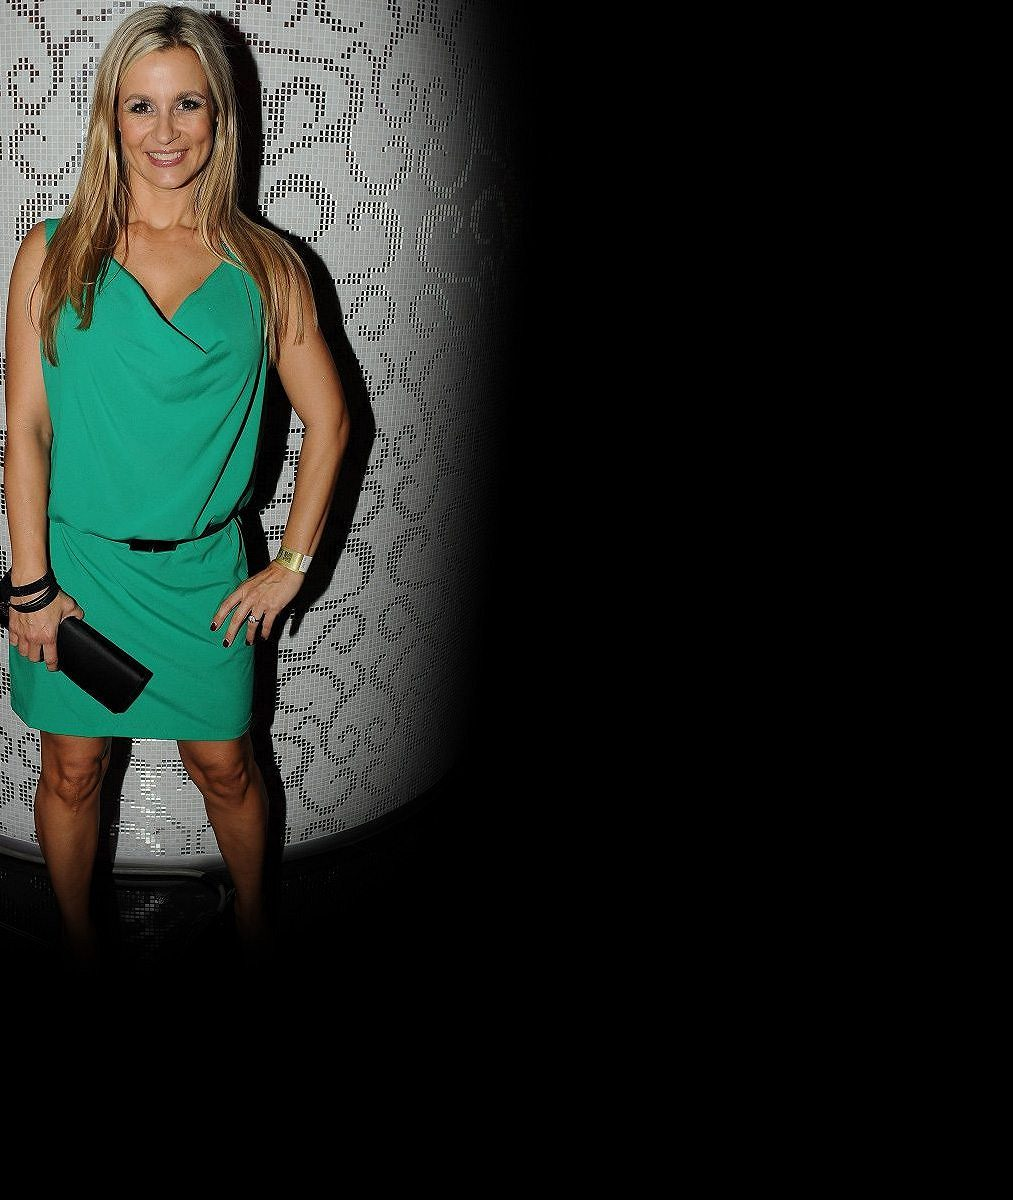 Monika Marešová promluvila o rozvodu s Leošem: Nechá si jeho jméno